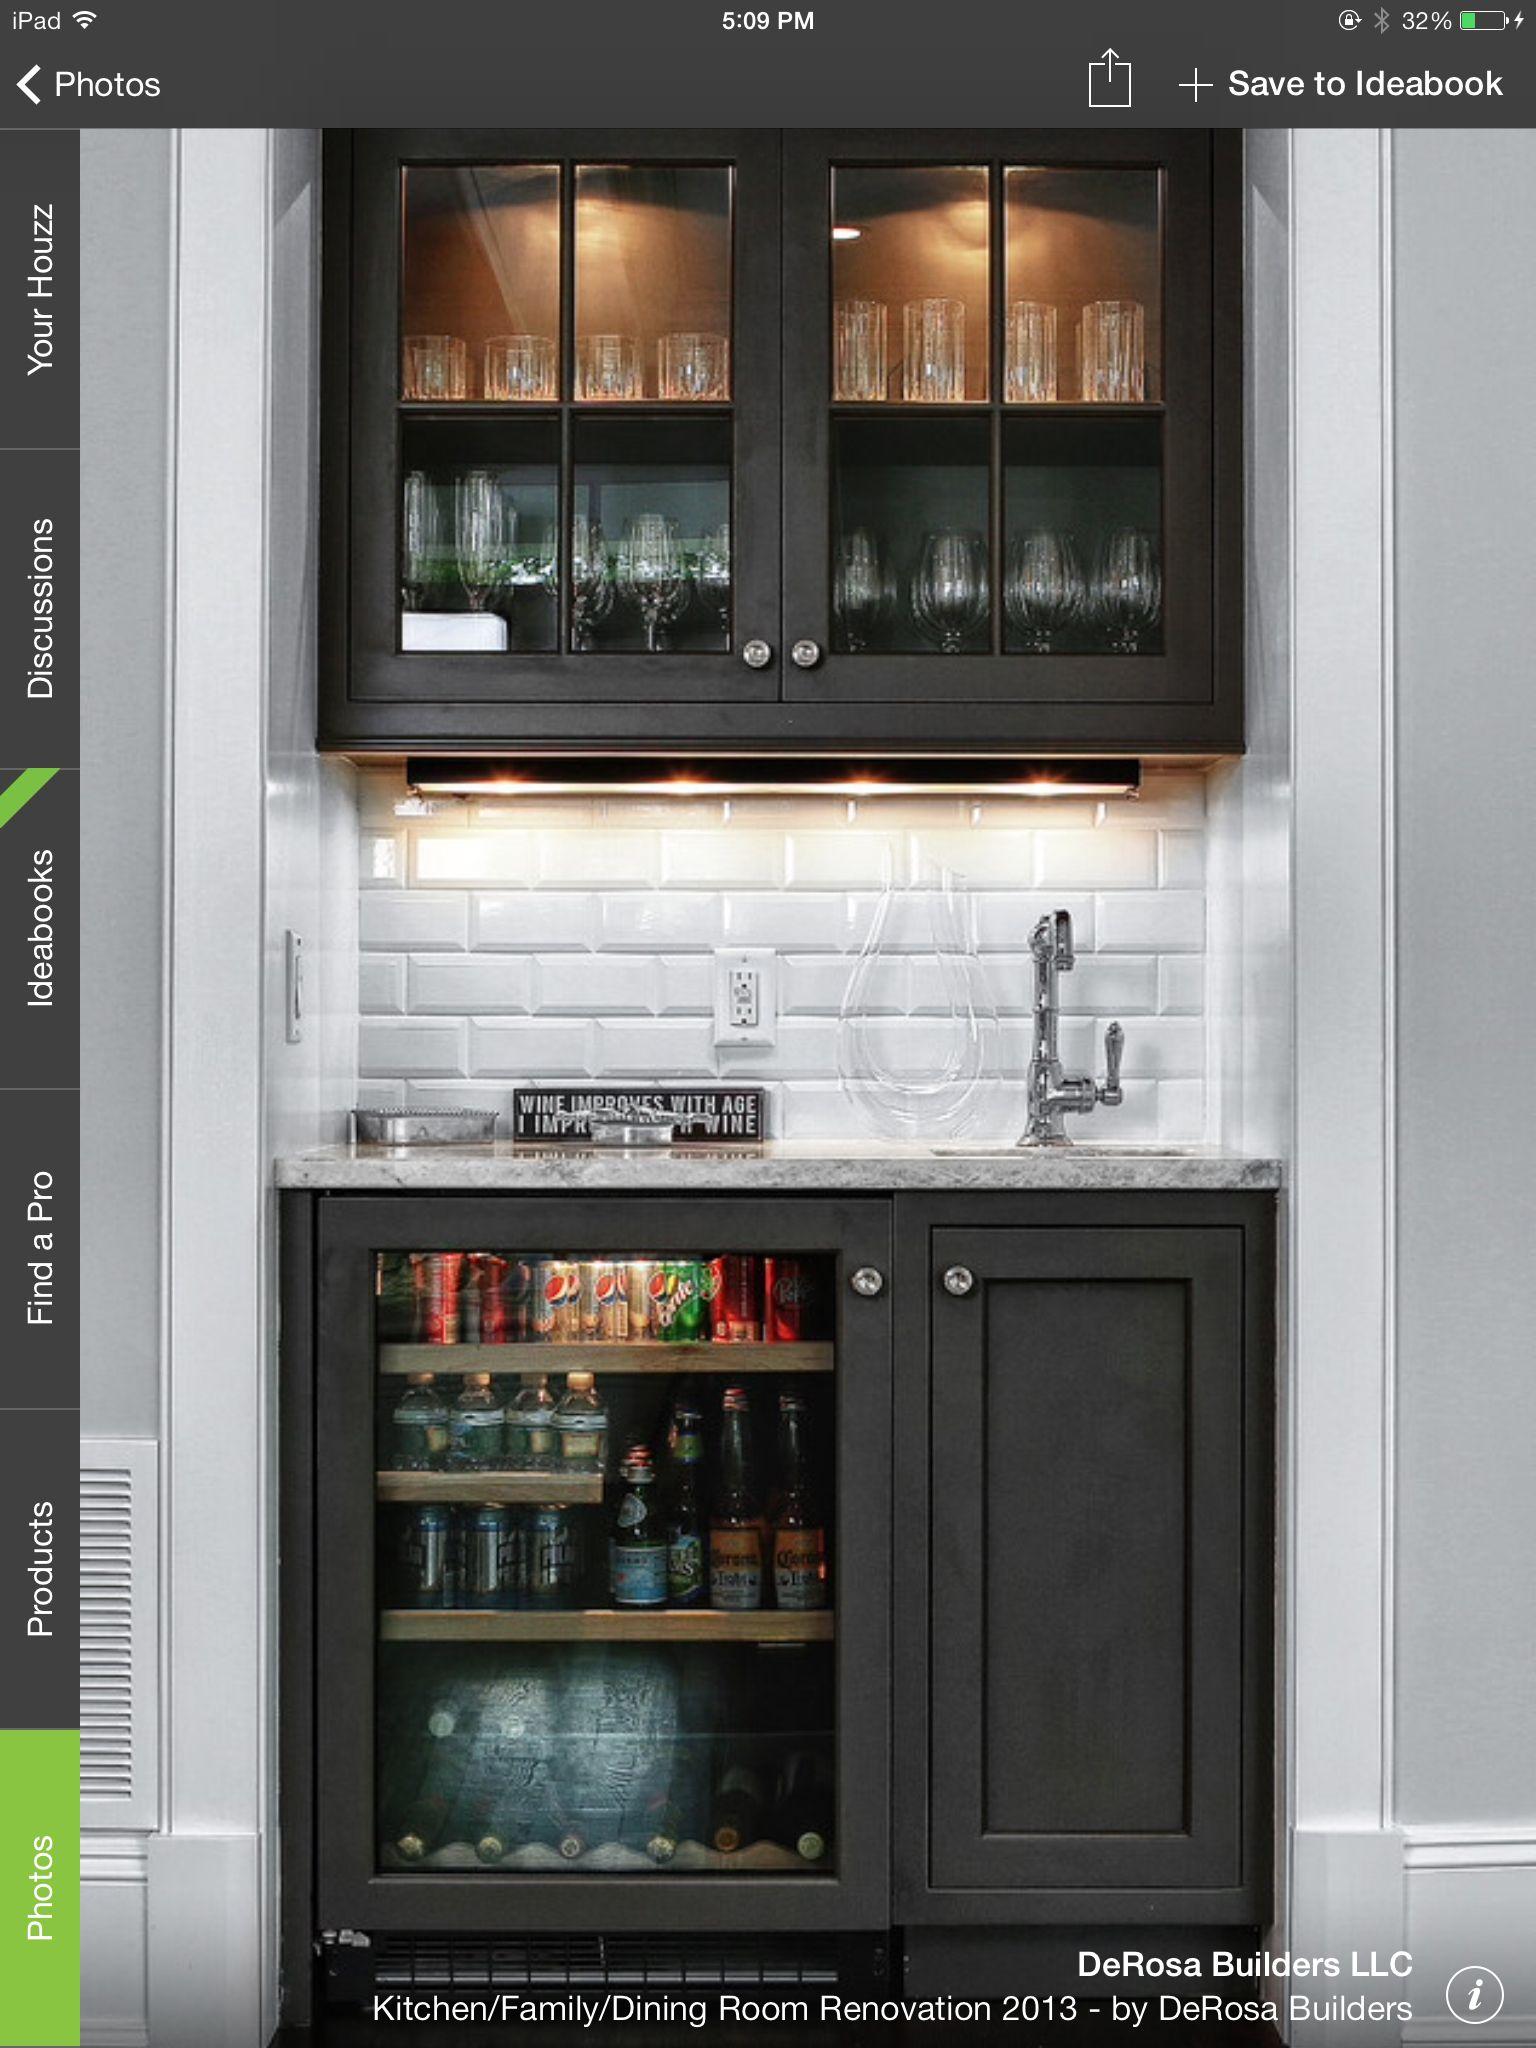 Pin by Armando Visbal Rivera on Yummy Kitchens   Small bars for ...